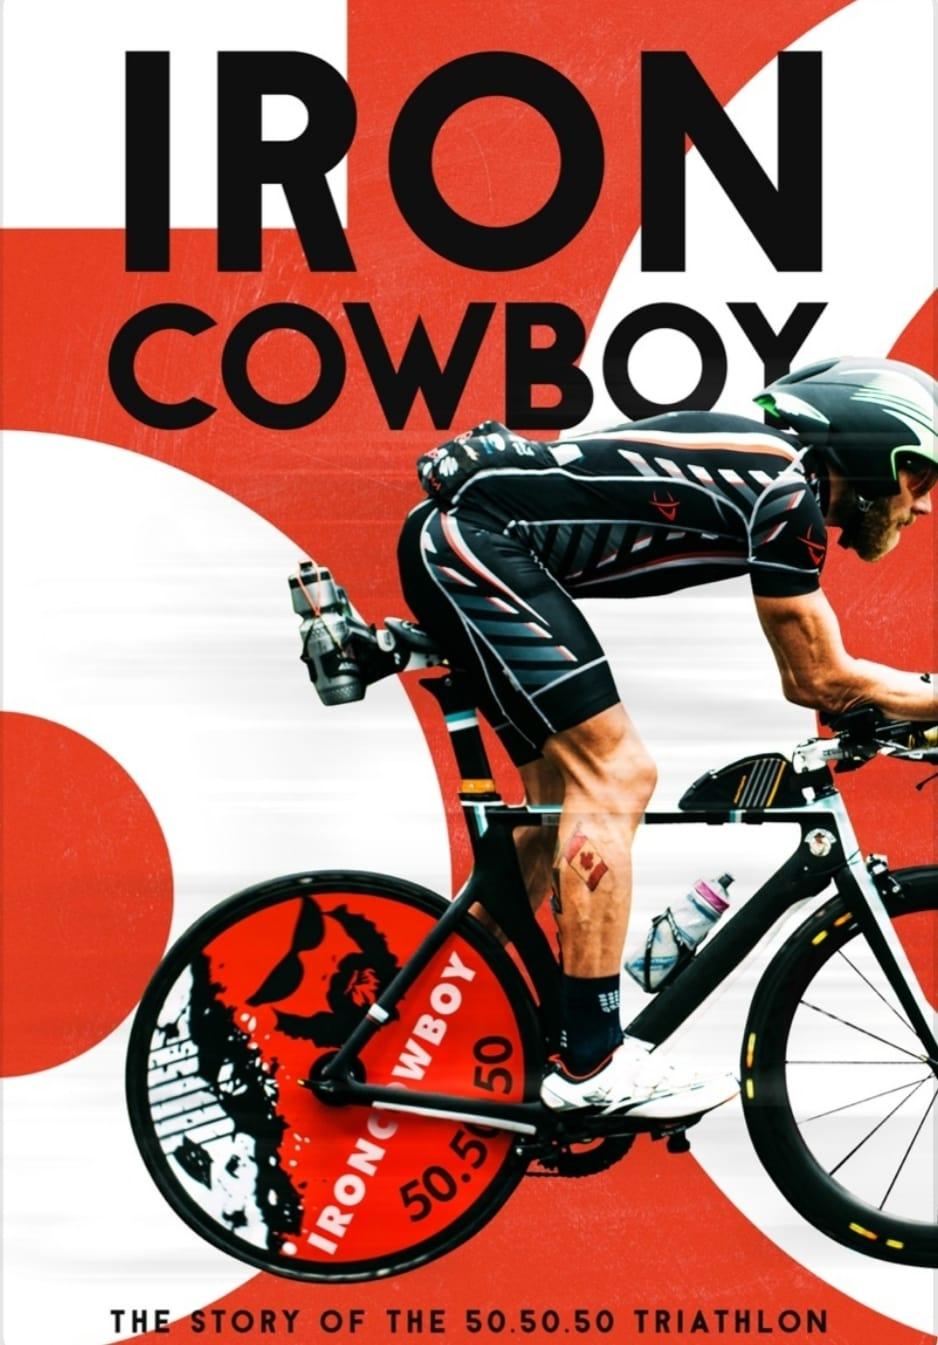 Iron Cowboy: The Story of the 50.50.50 Triathlon (2018)